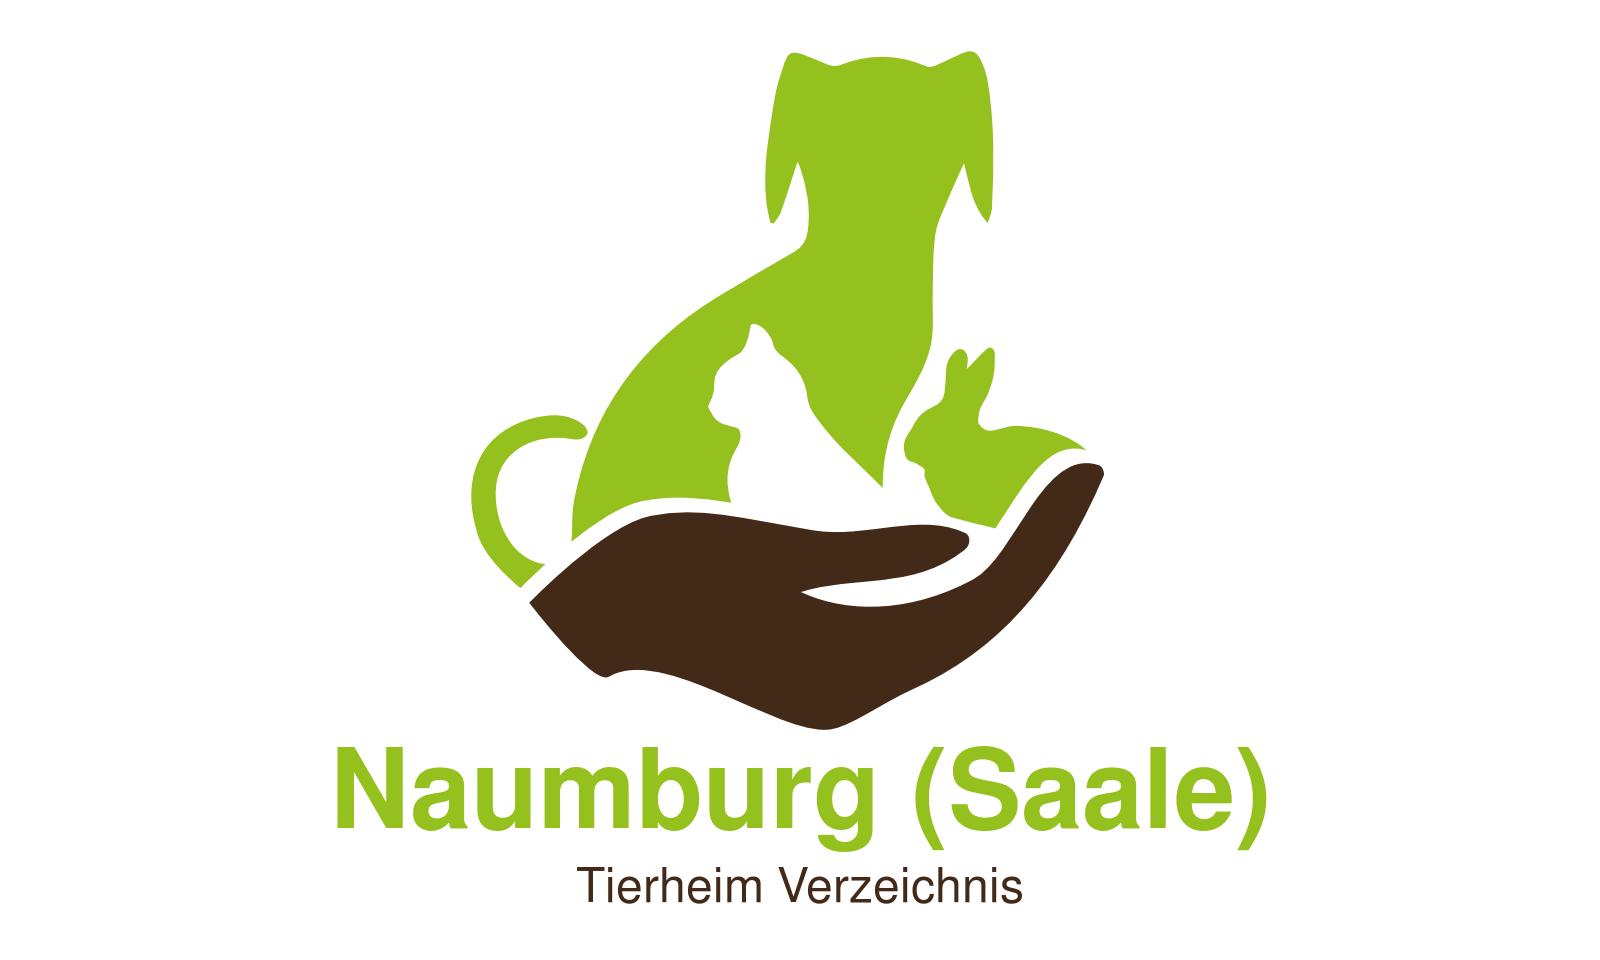 Tierheim Naumburg (Saale)